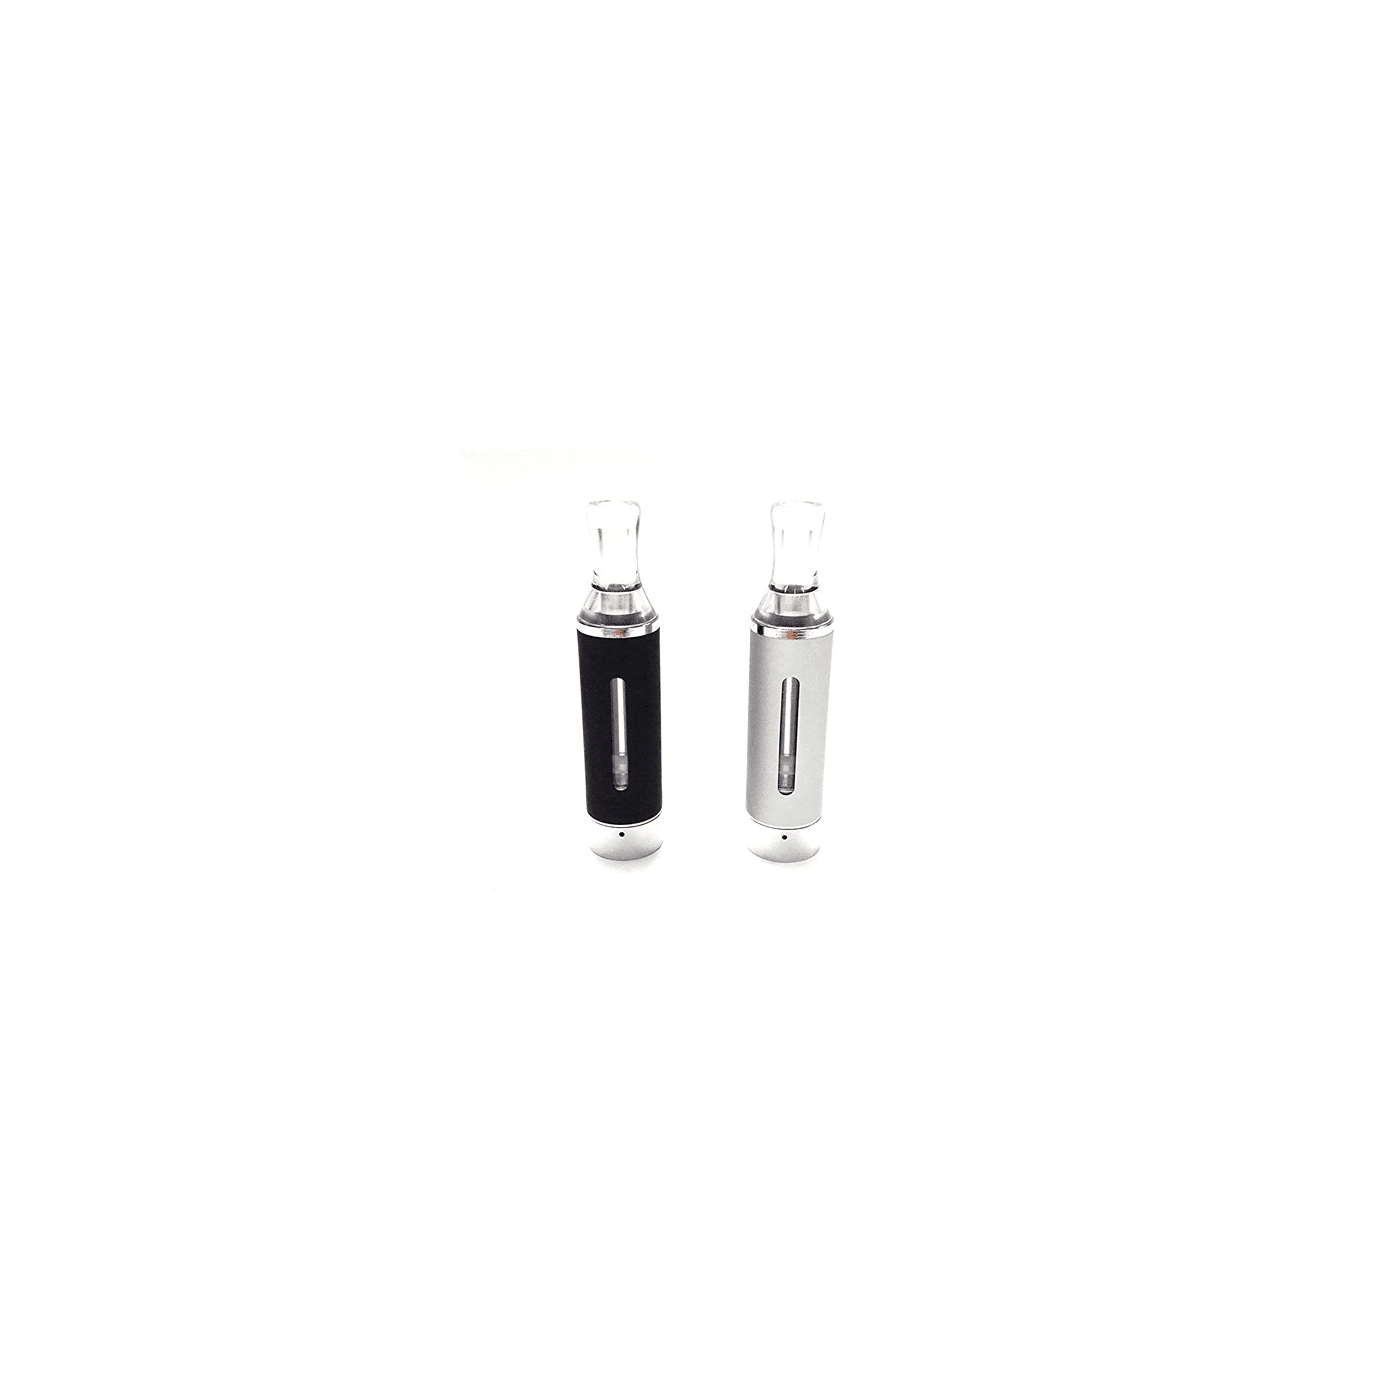 DBox D-VOD - 2.2 ohm